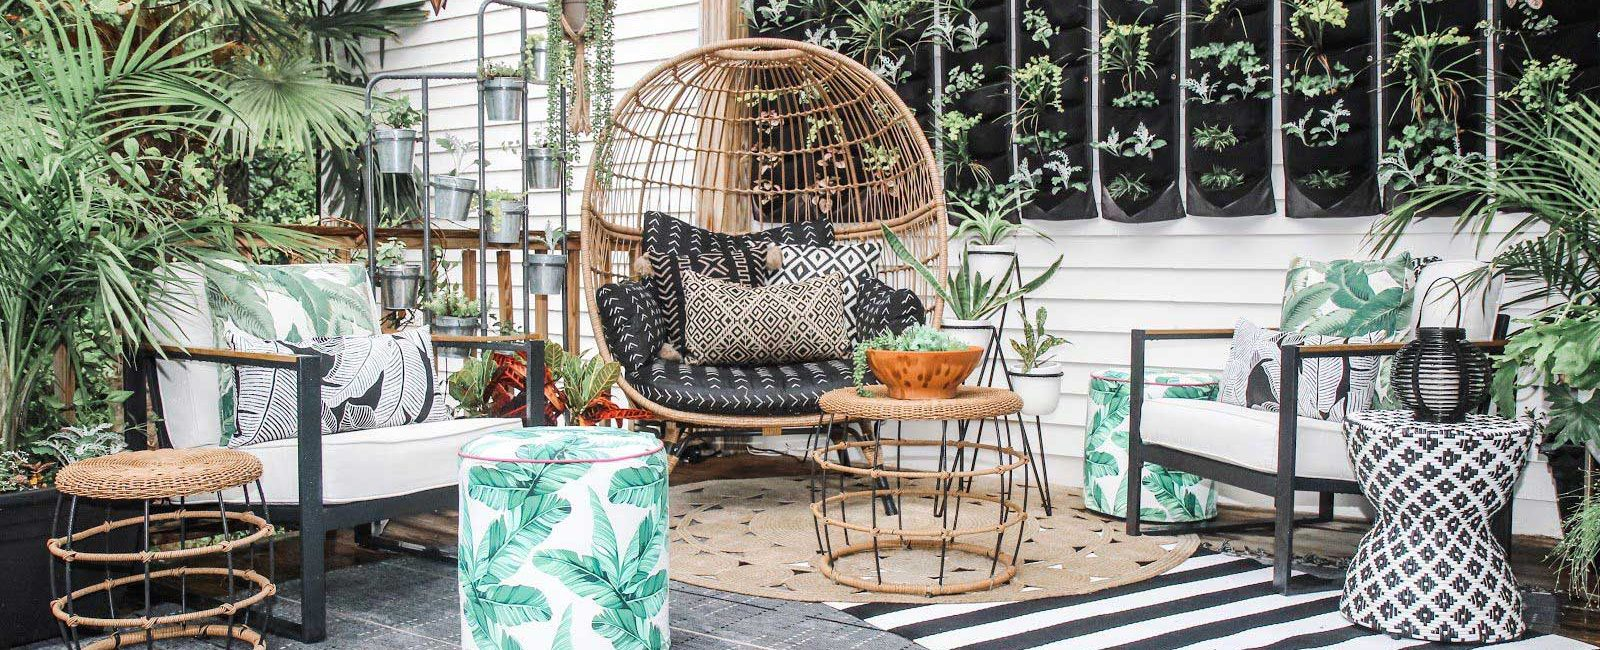 Cosy Outdoor Living Area